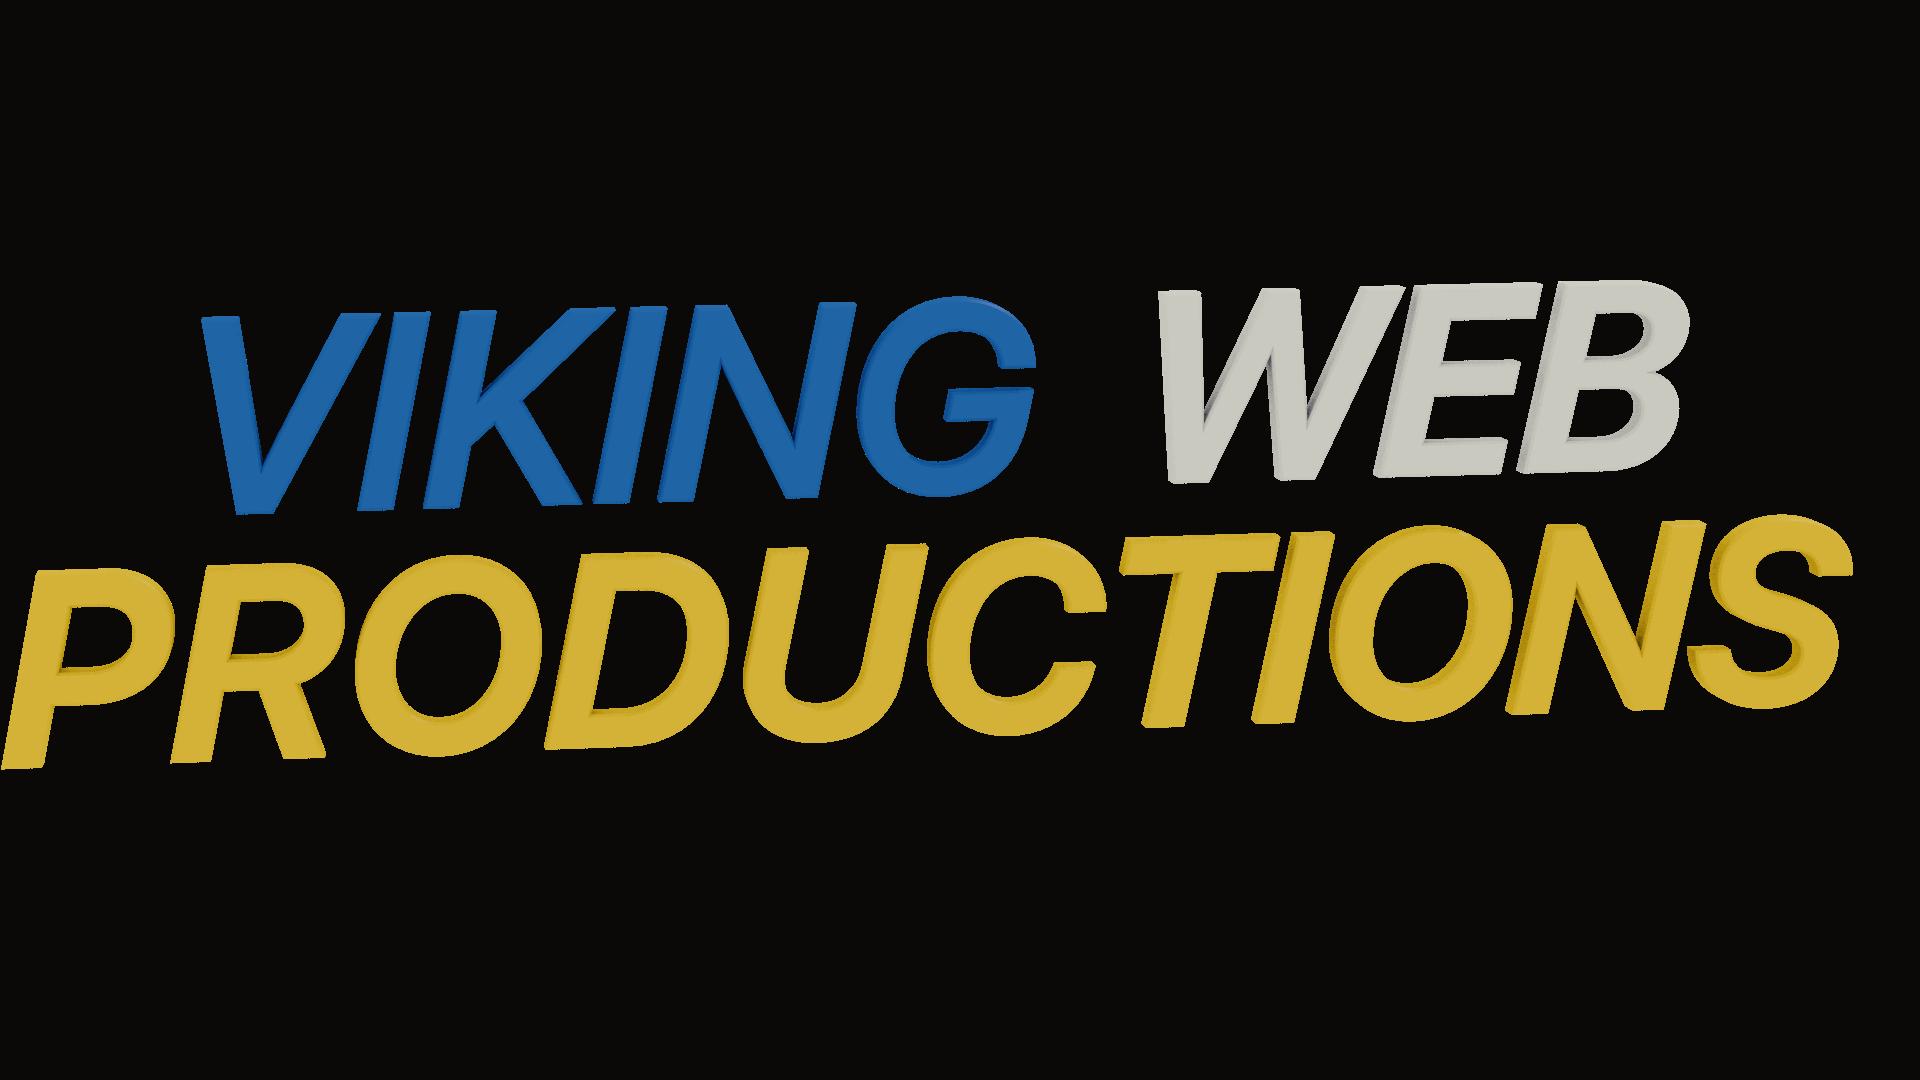 viking web productions